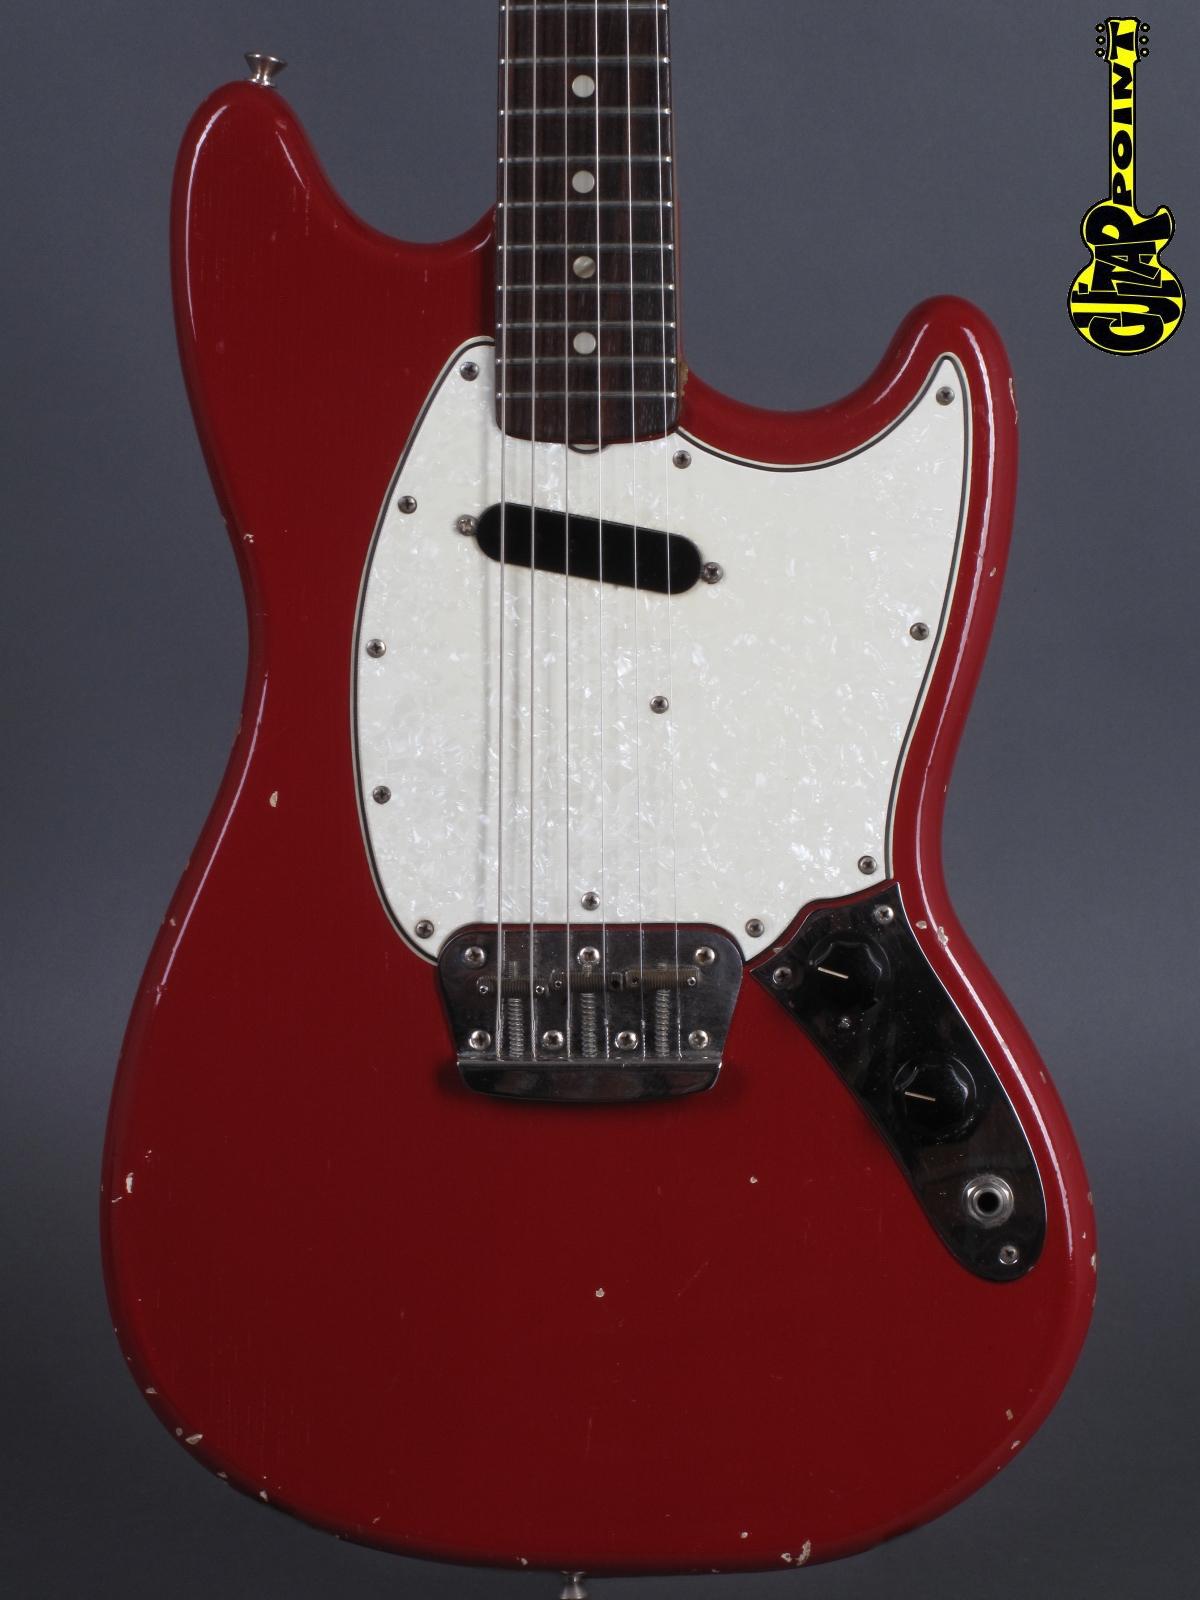 1965 Fender Musicmaster II – Dacota Red